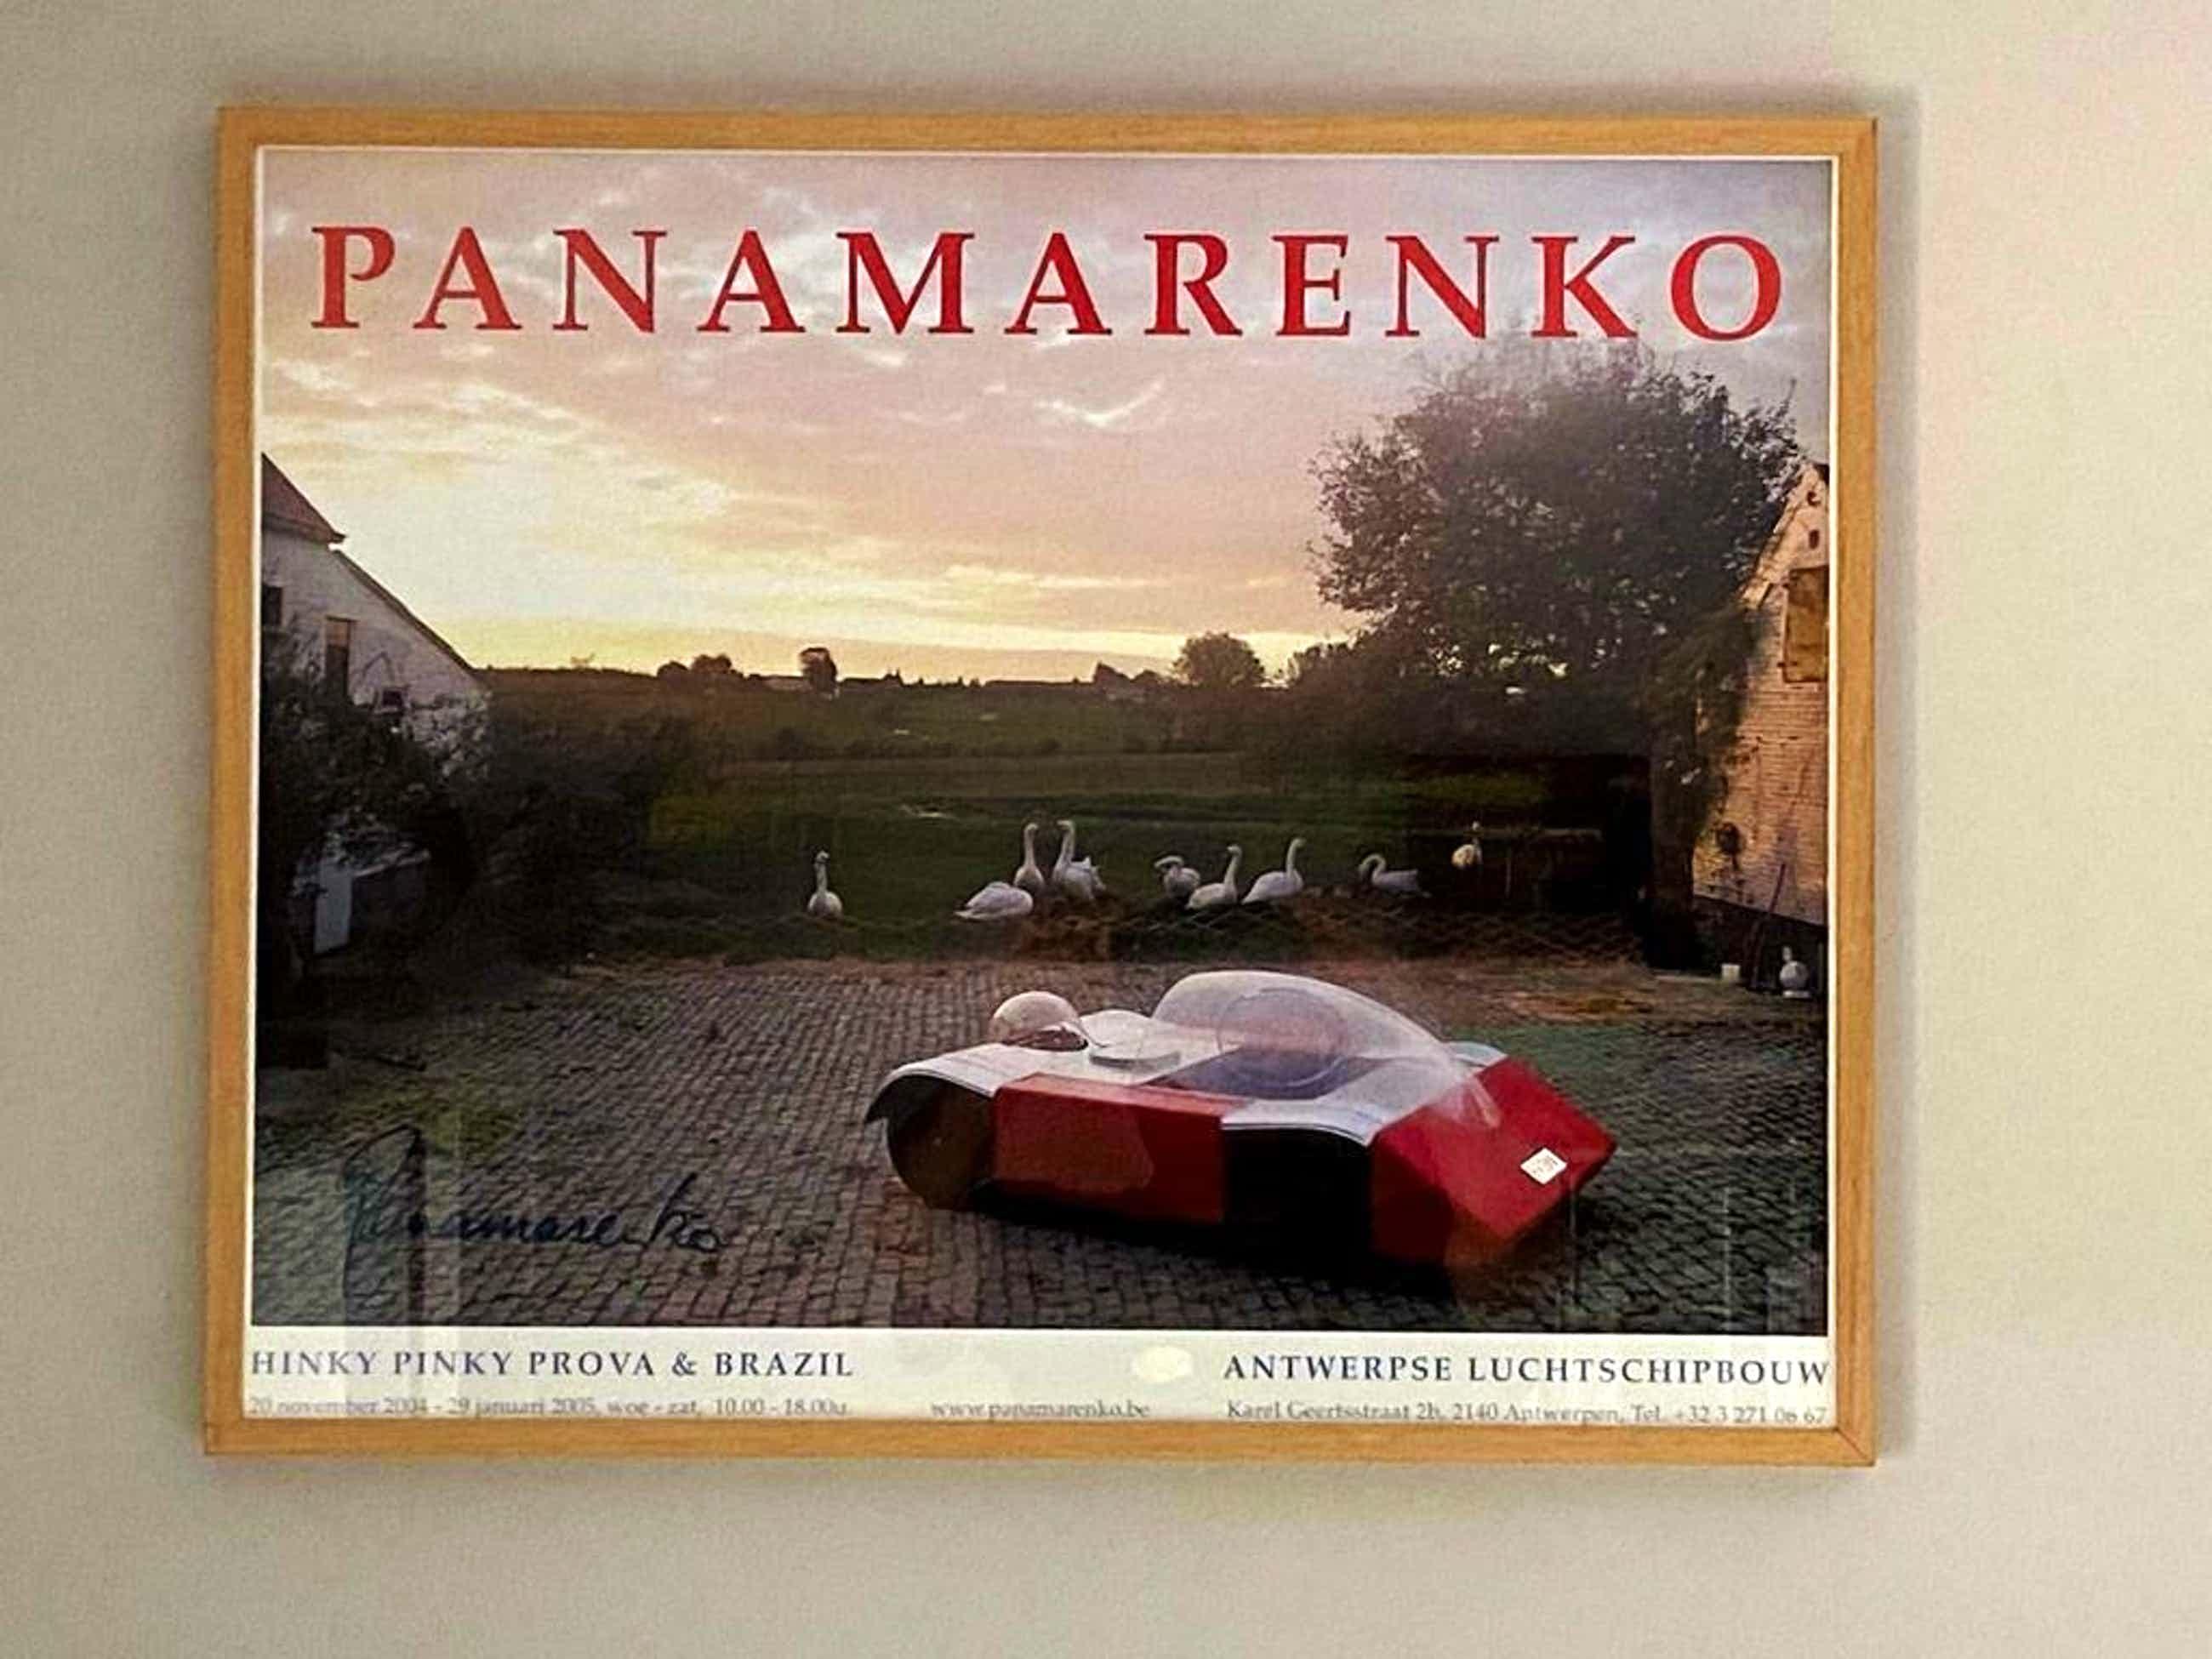 Panamarenko - Hinky Pinky Prova & Brazil kopen? Bied vanaf 240!